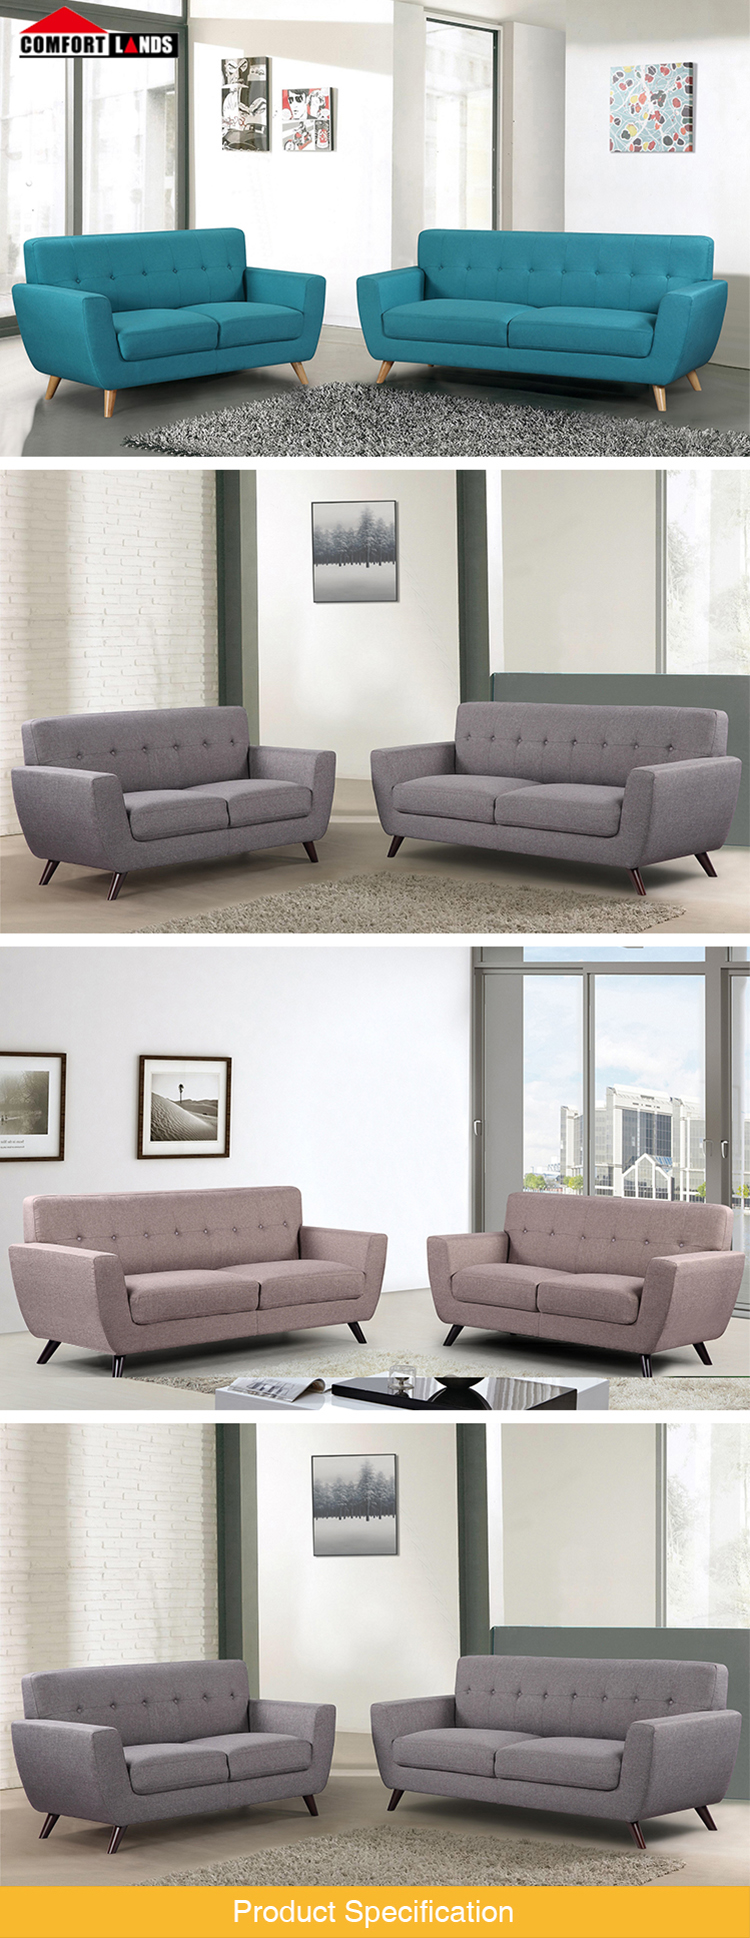 Latest Design Wooden Leg Sofa Set Fabric Contemporary Sofa For